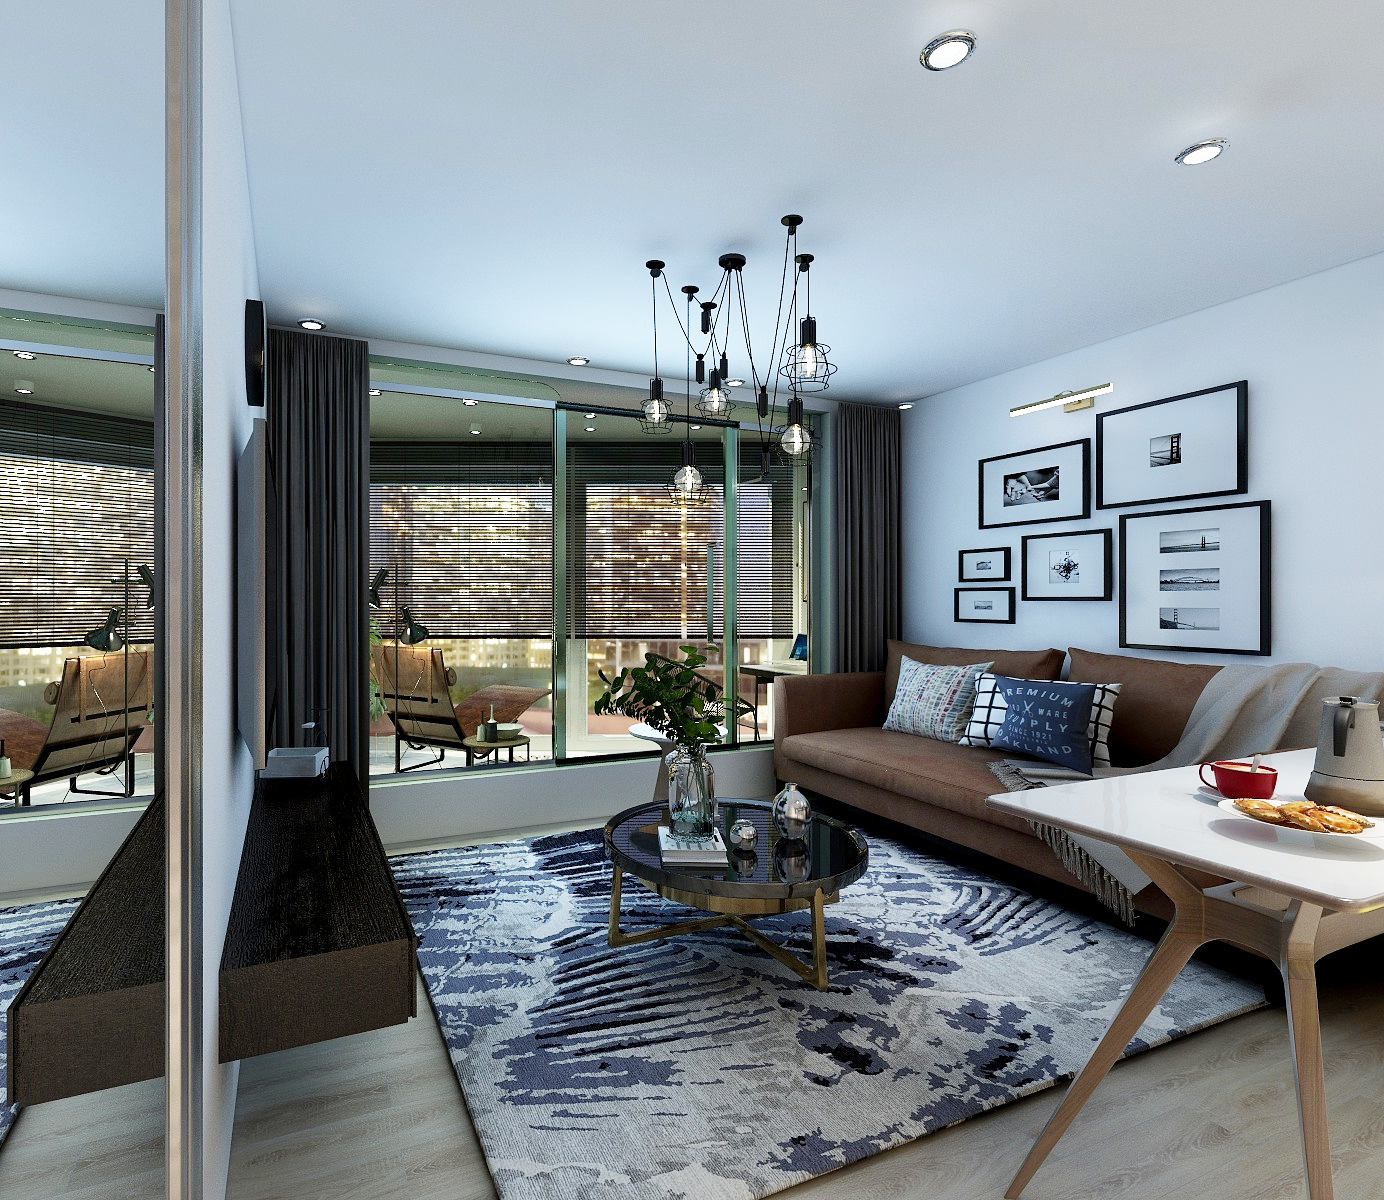 davey bacaron 3d interior visualization of an eclectic contemporary livingroom interior design